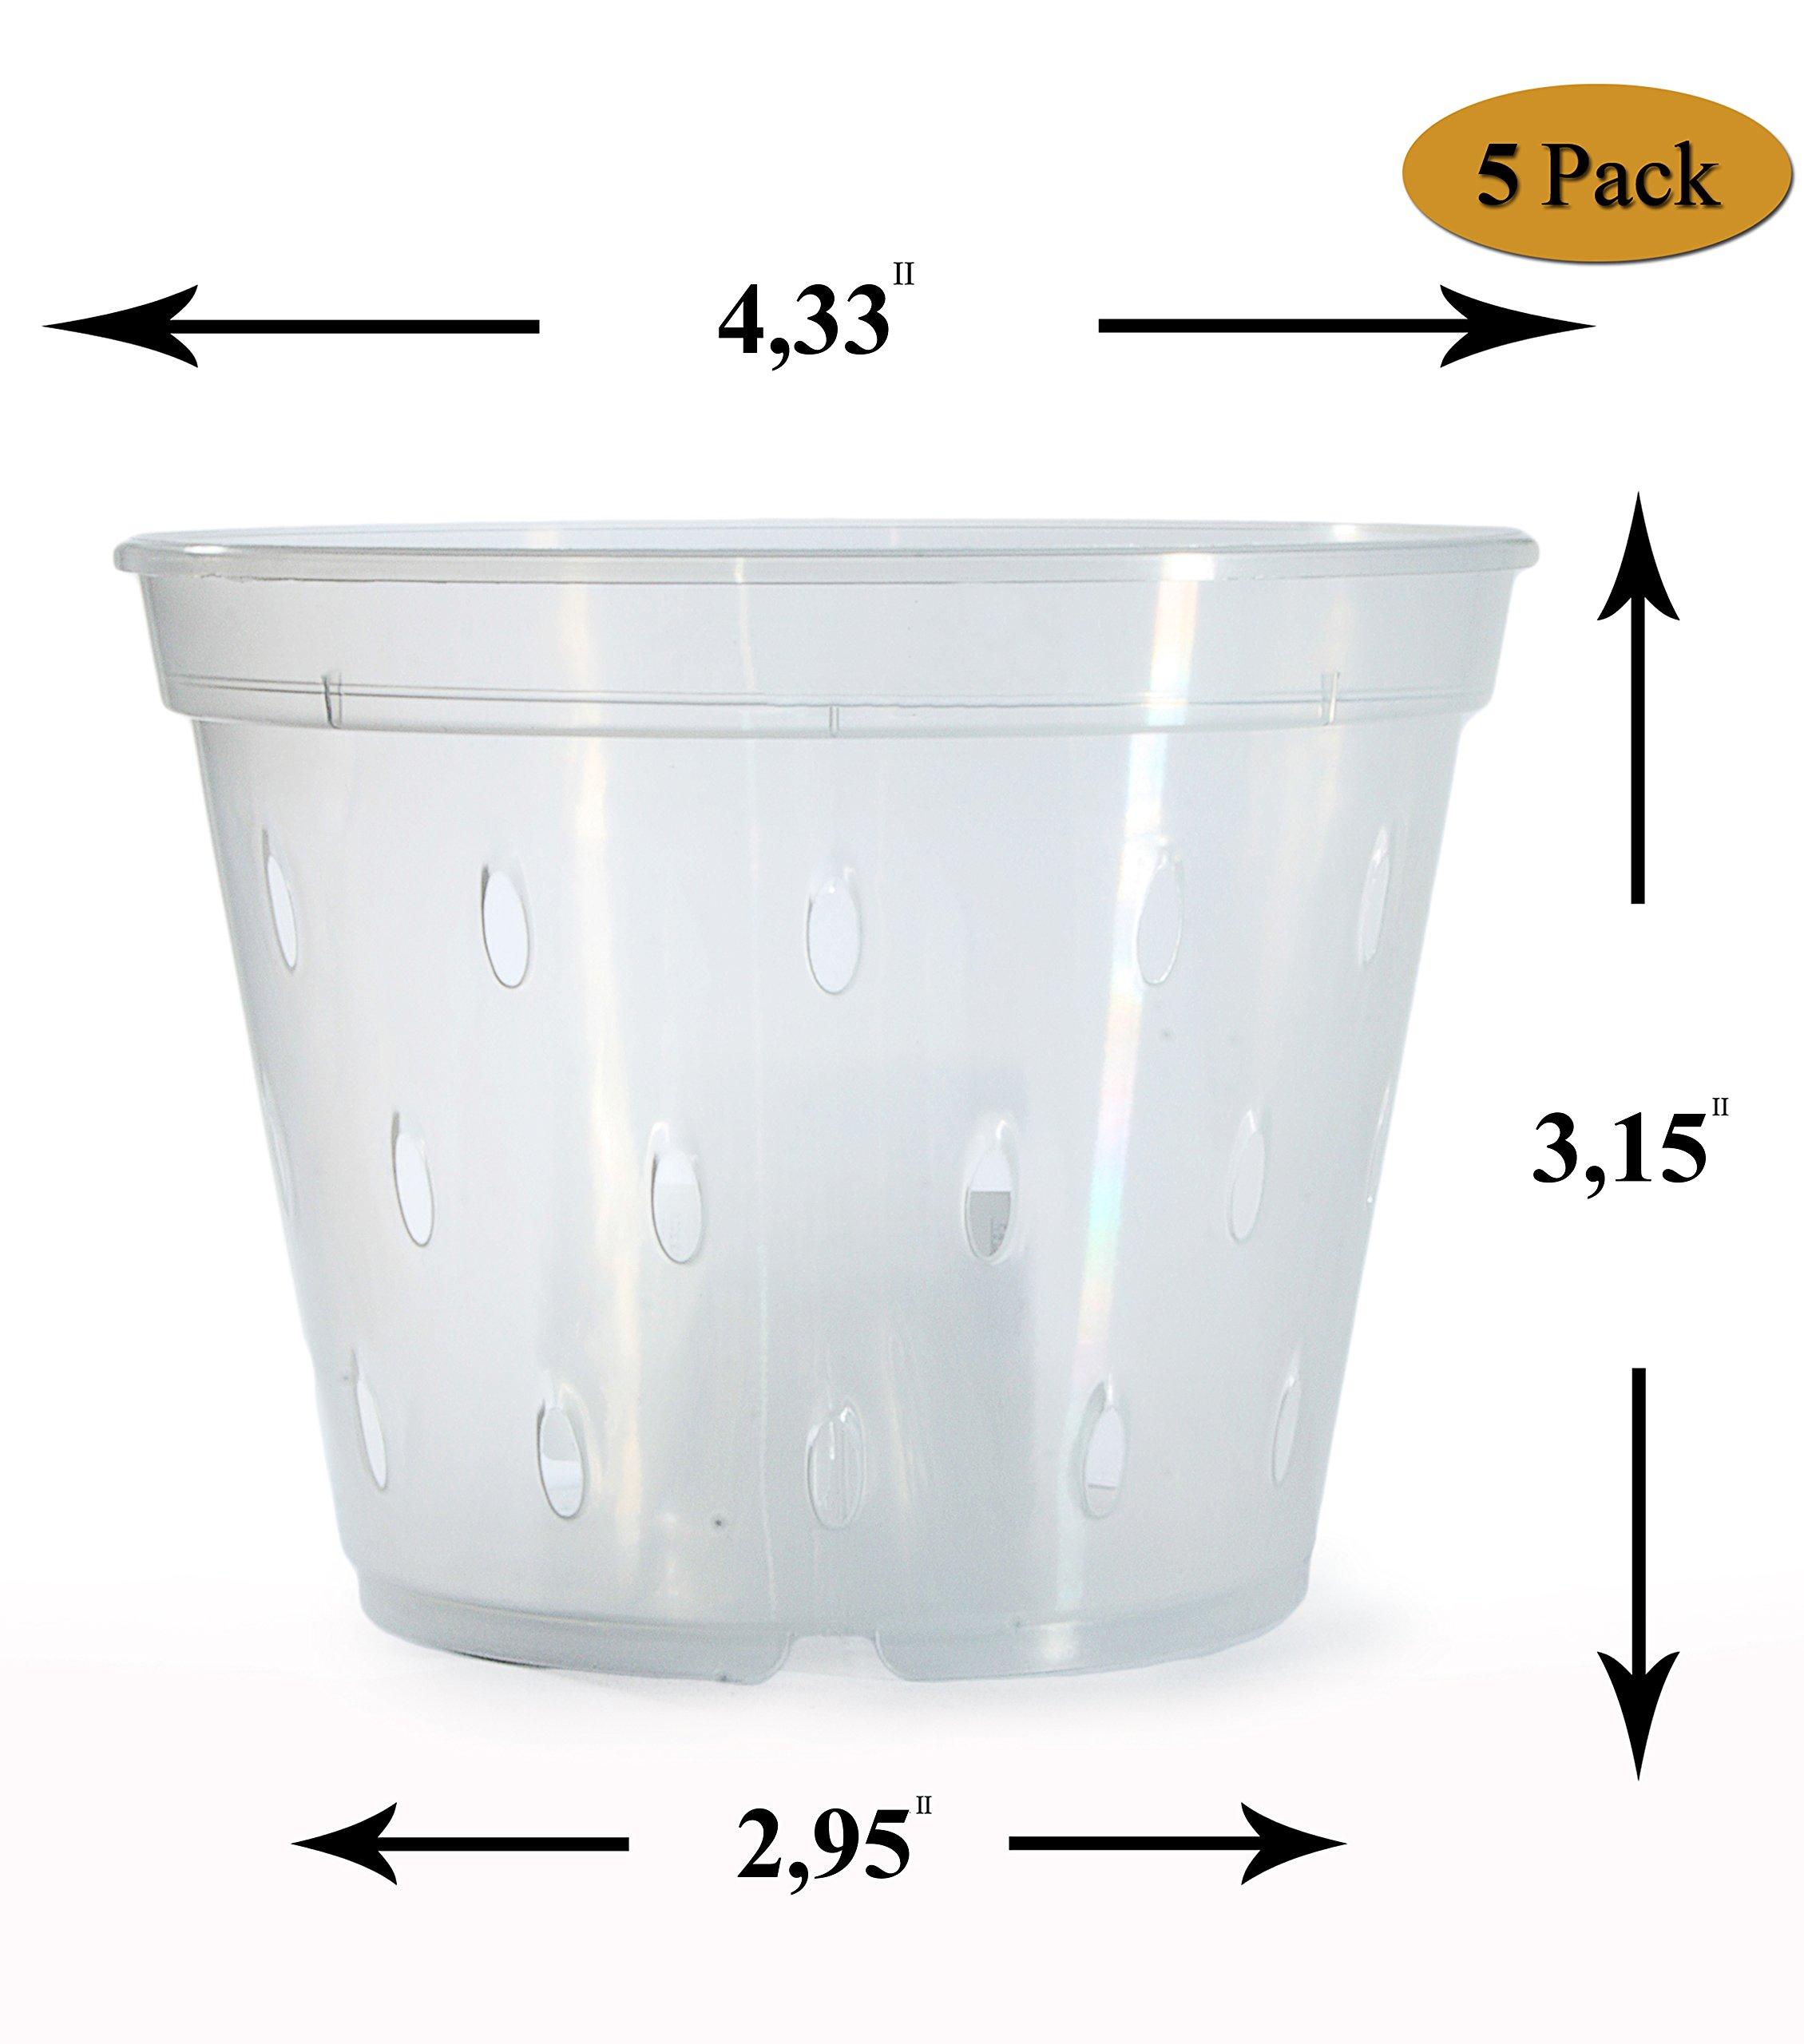 Orchid Pots With Holes Plastic-Orchid Pot-Clear Orchid Pot-4.5 inch-Orchids Pot-Plastic Orchid Pots-Pots For Orchids-Slotted Orchid Pot-Clear Plastic Pot-Orchid Flower Pot-Orchid Plant Pot-5 Pack